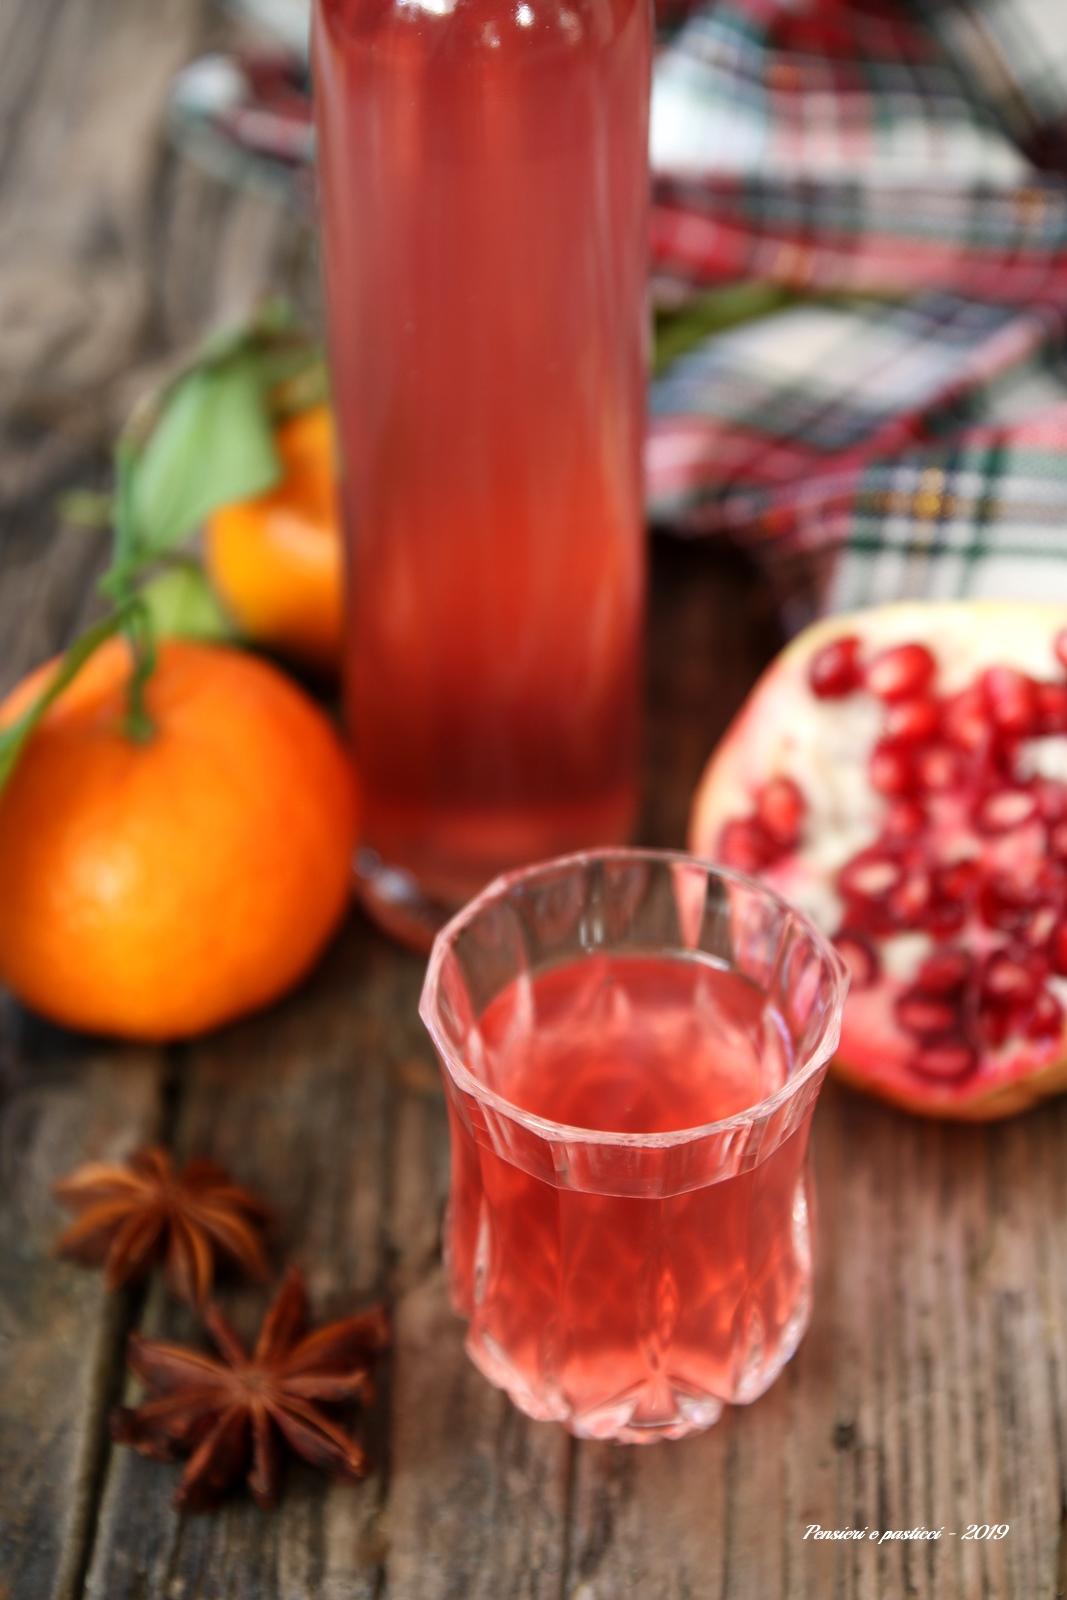 liquore alla melagrana agrumi e spezie